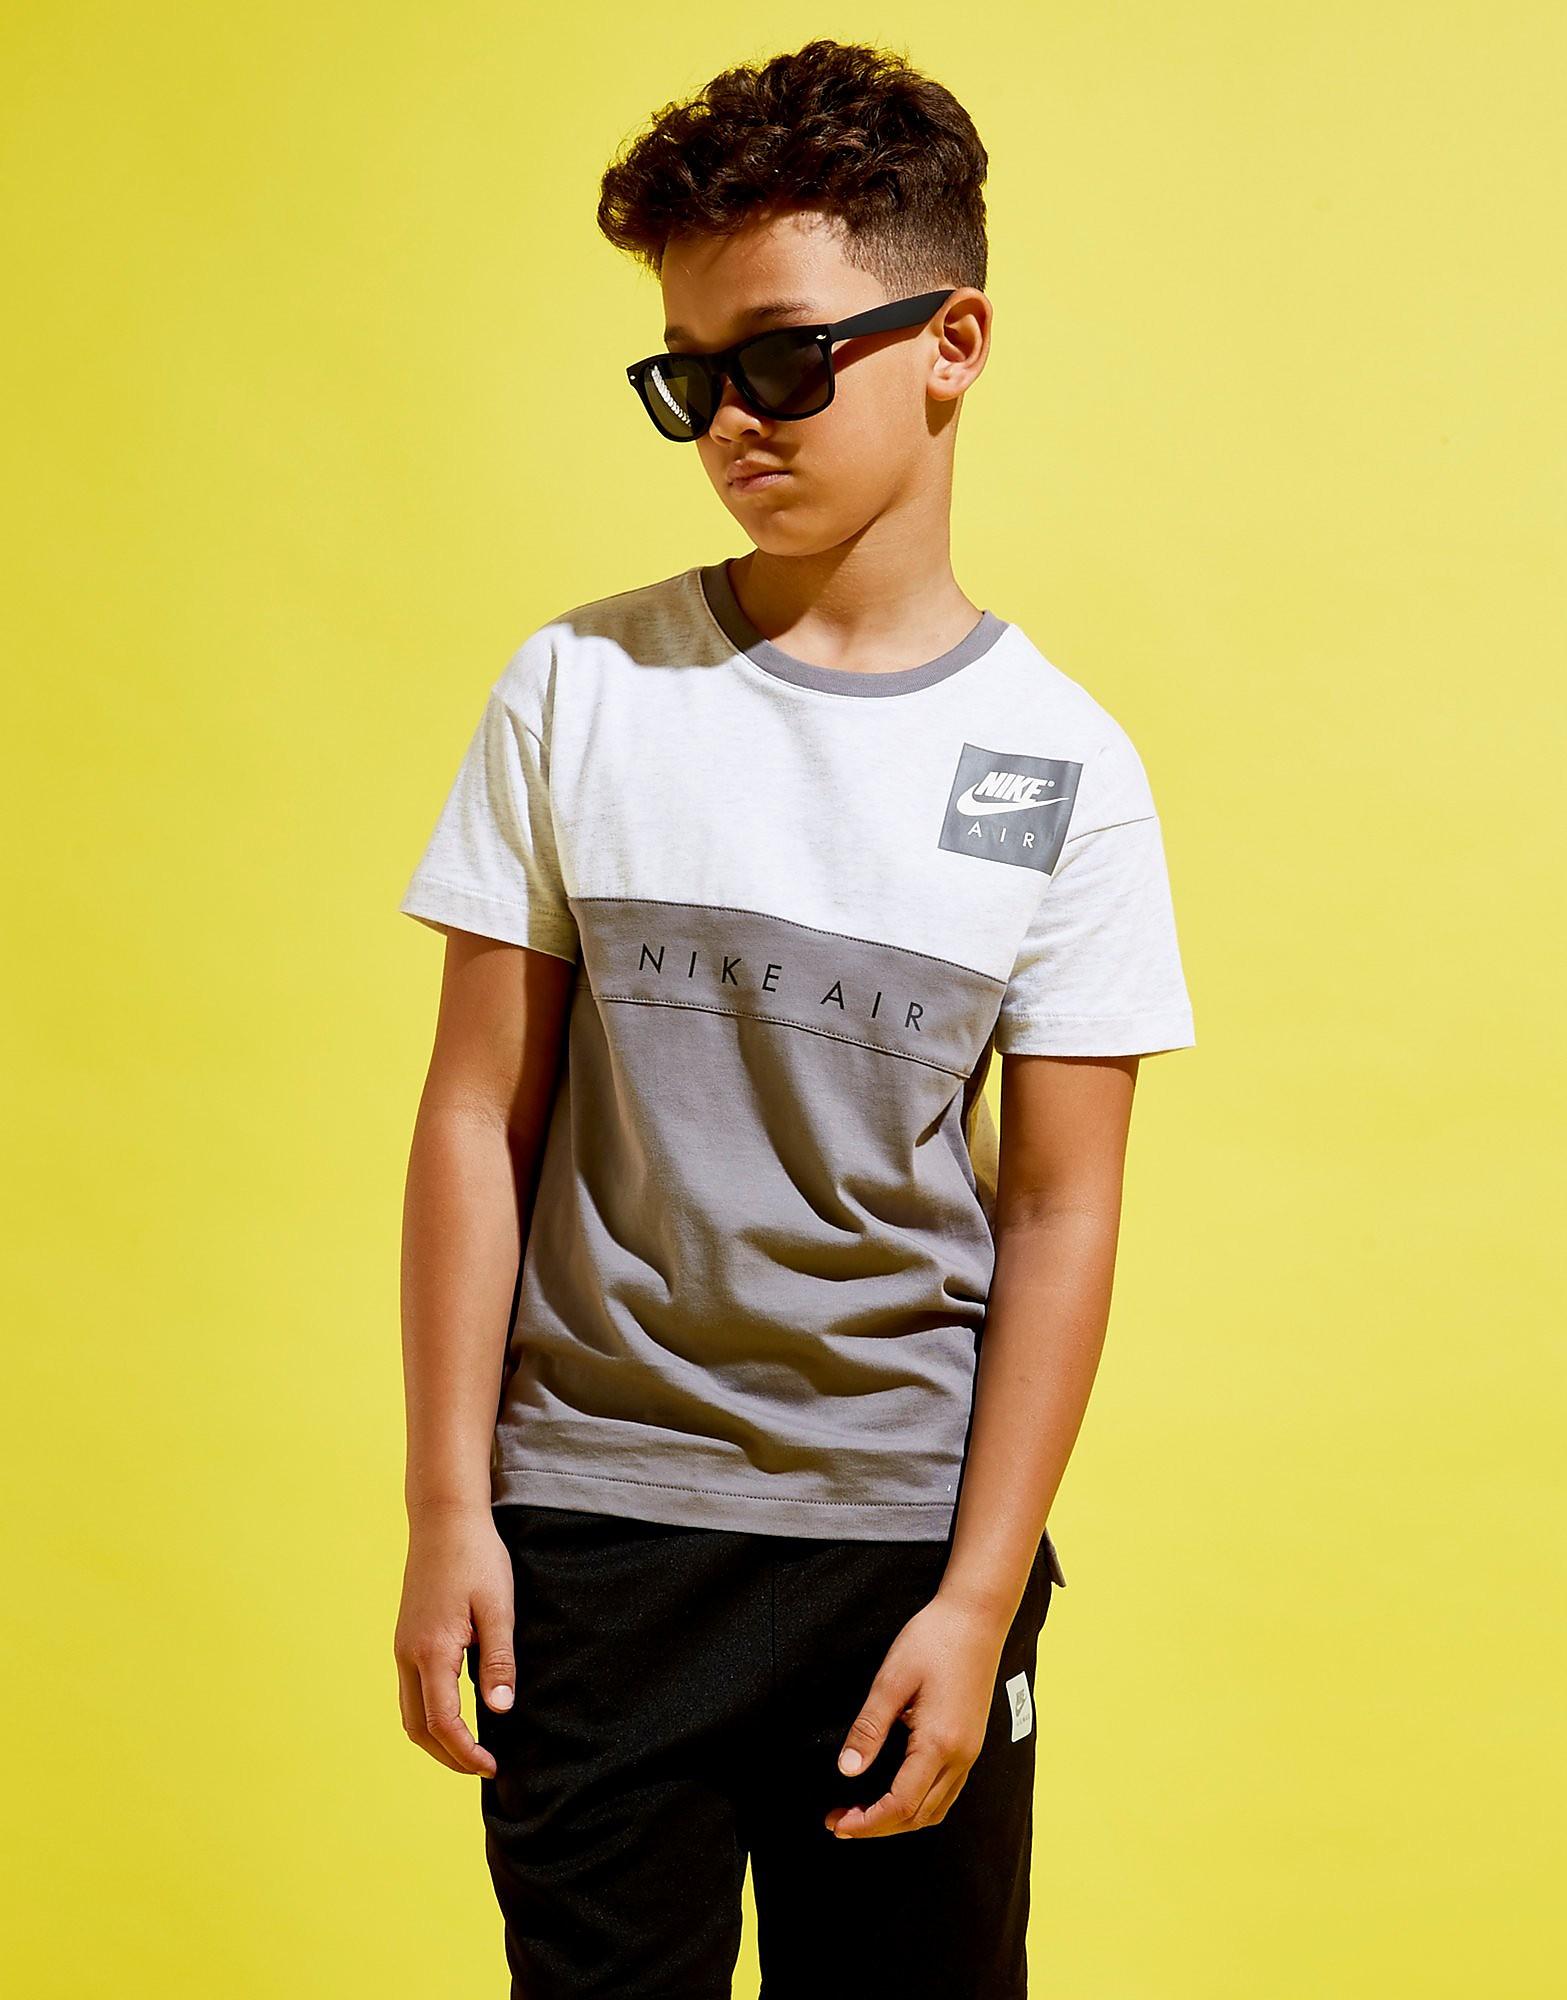 Nike Air camiseta Colourblock júnior